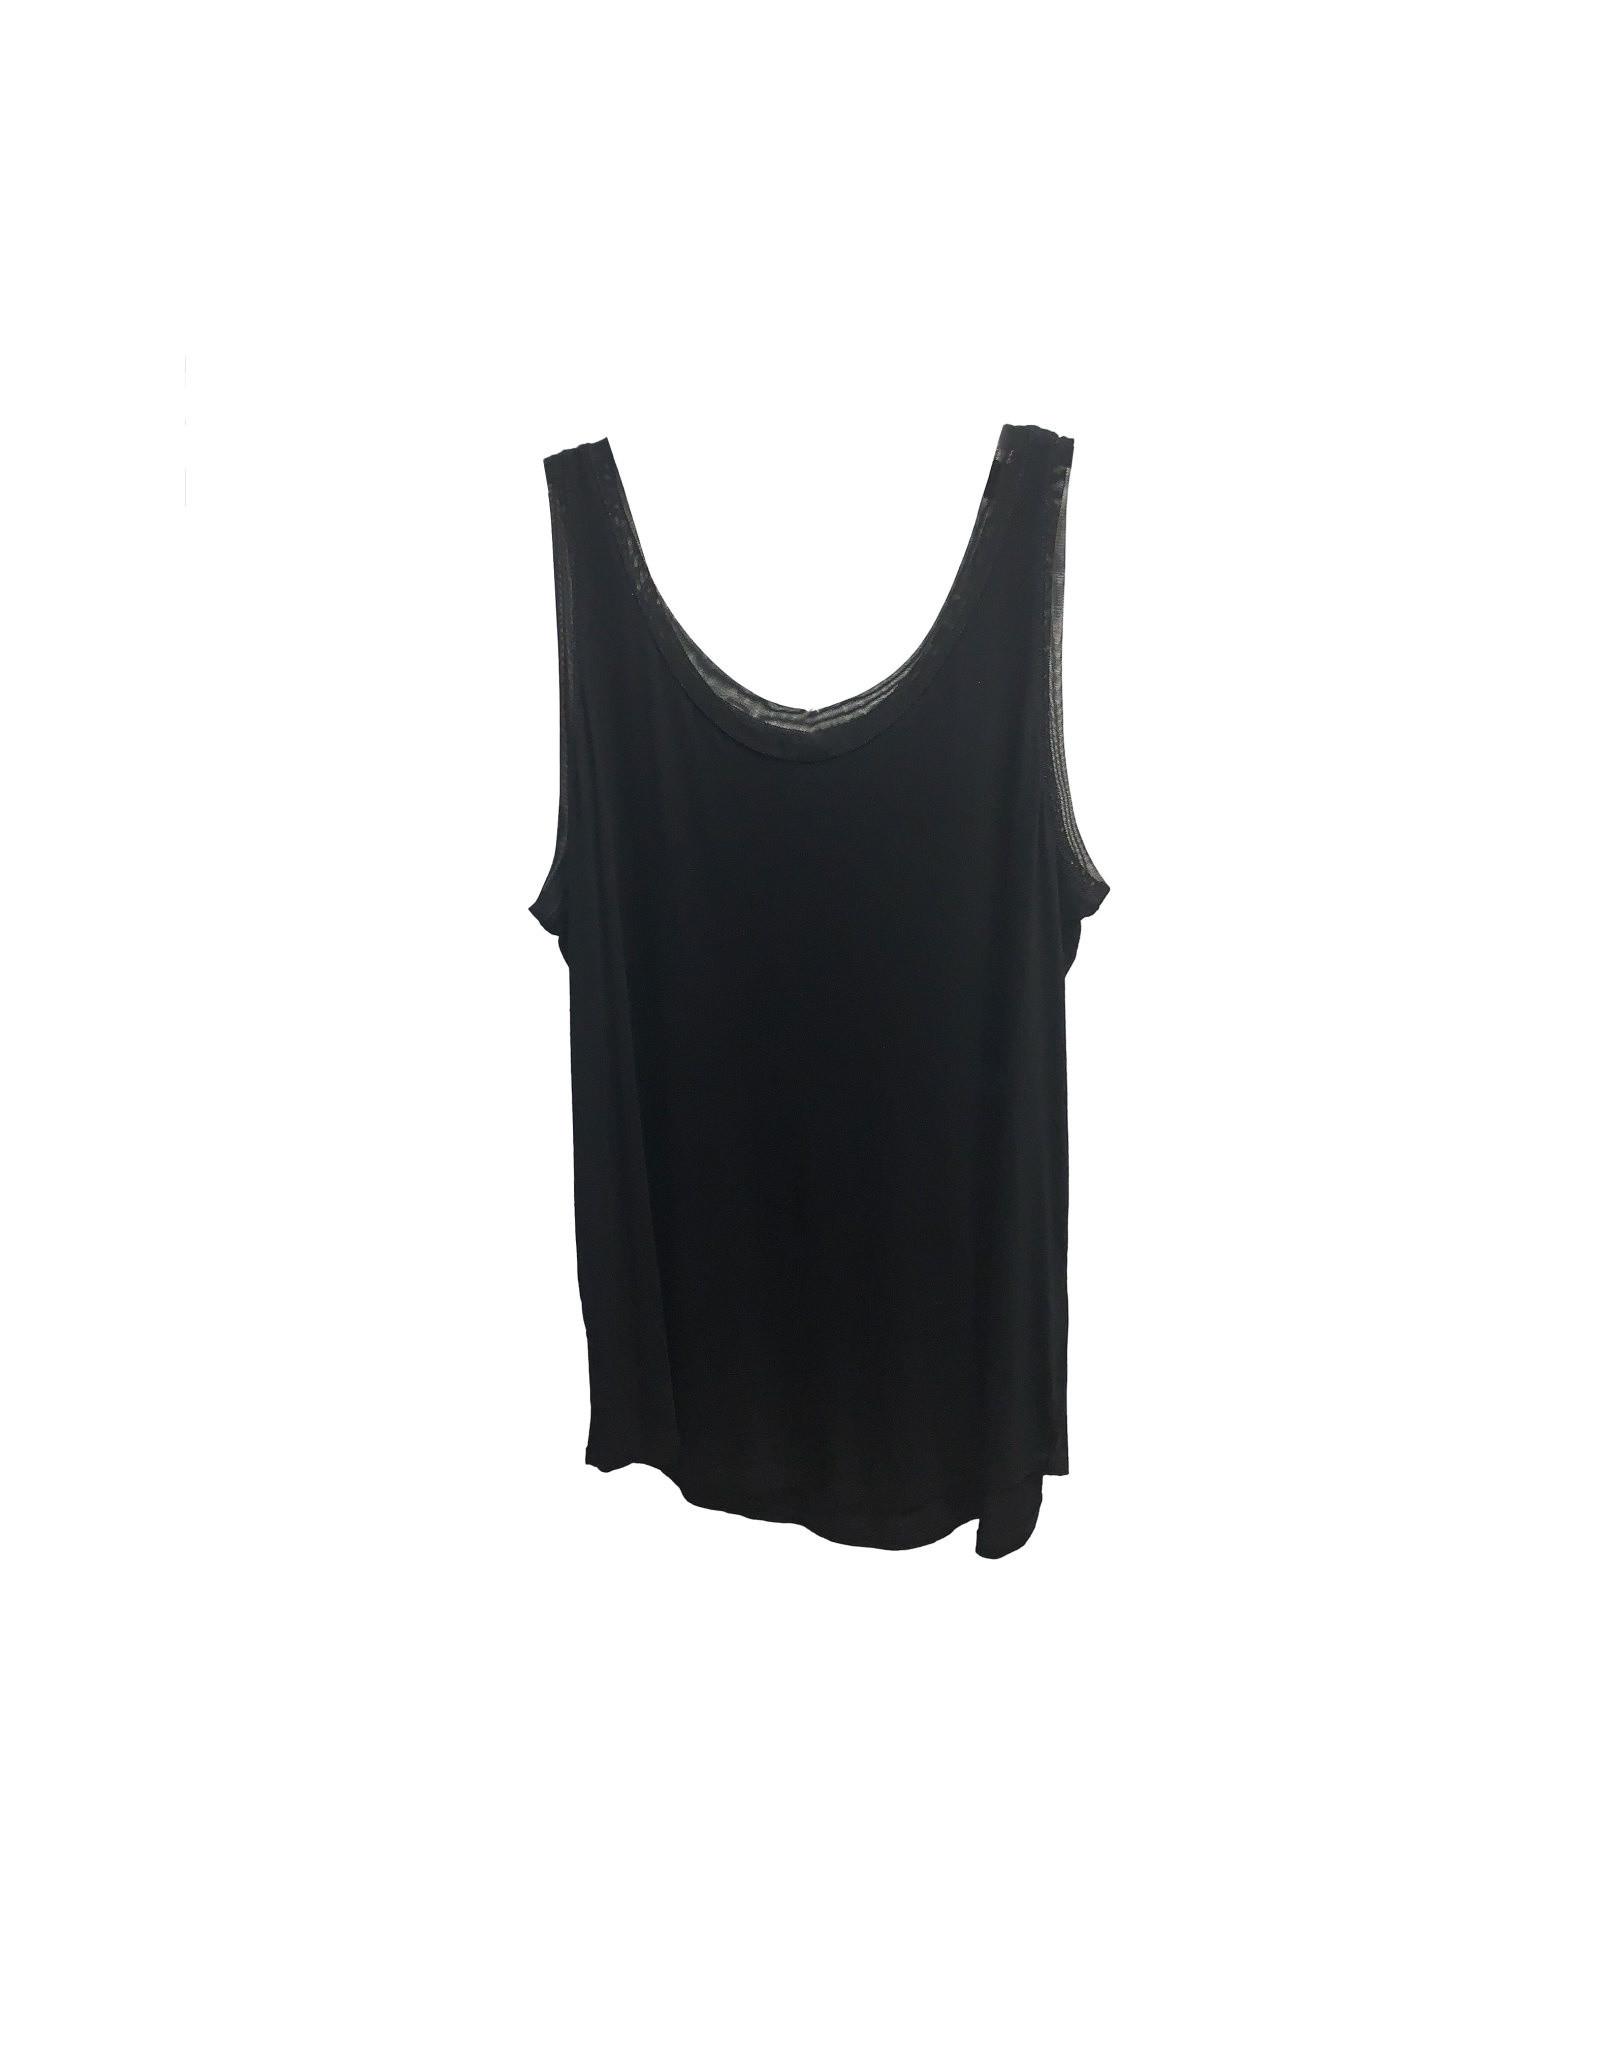 HUE HUE  Women's  Black Top  Size XL